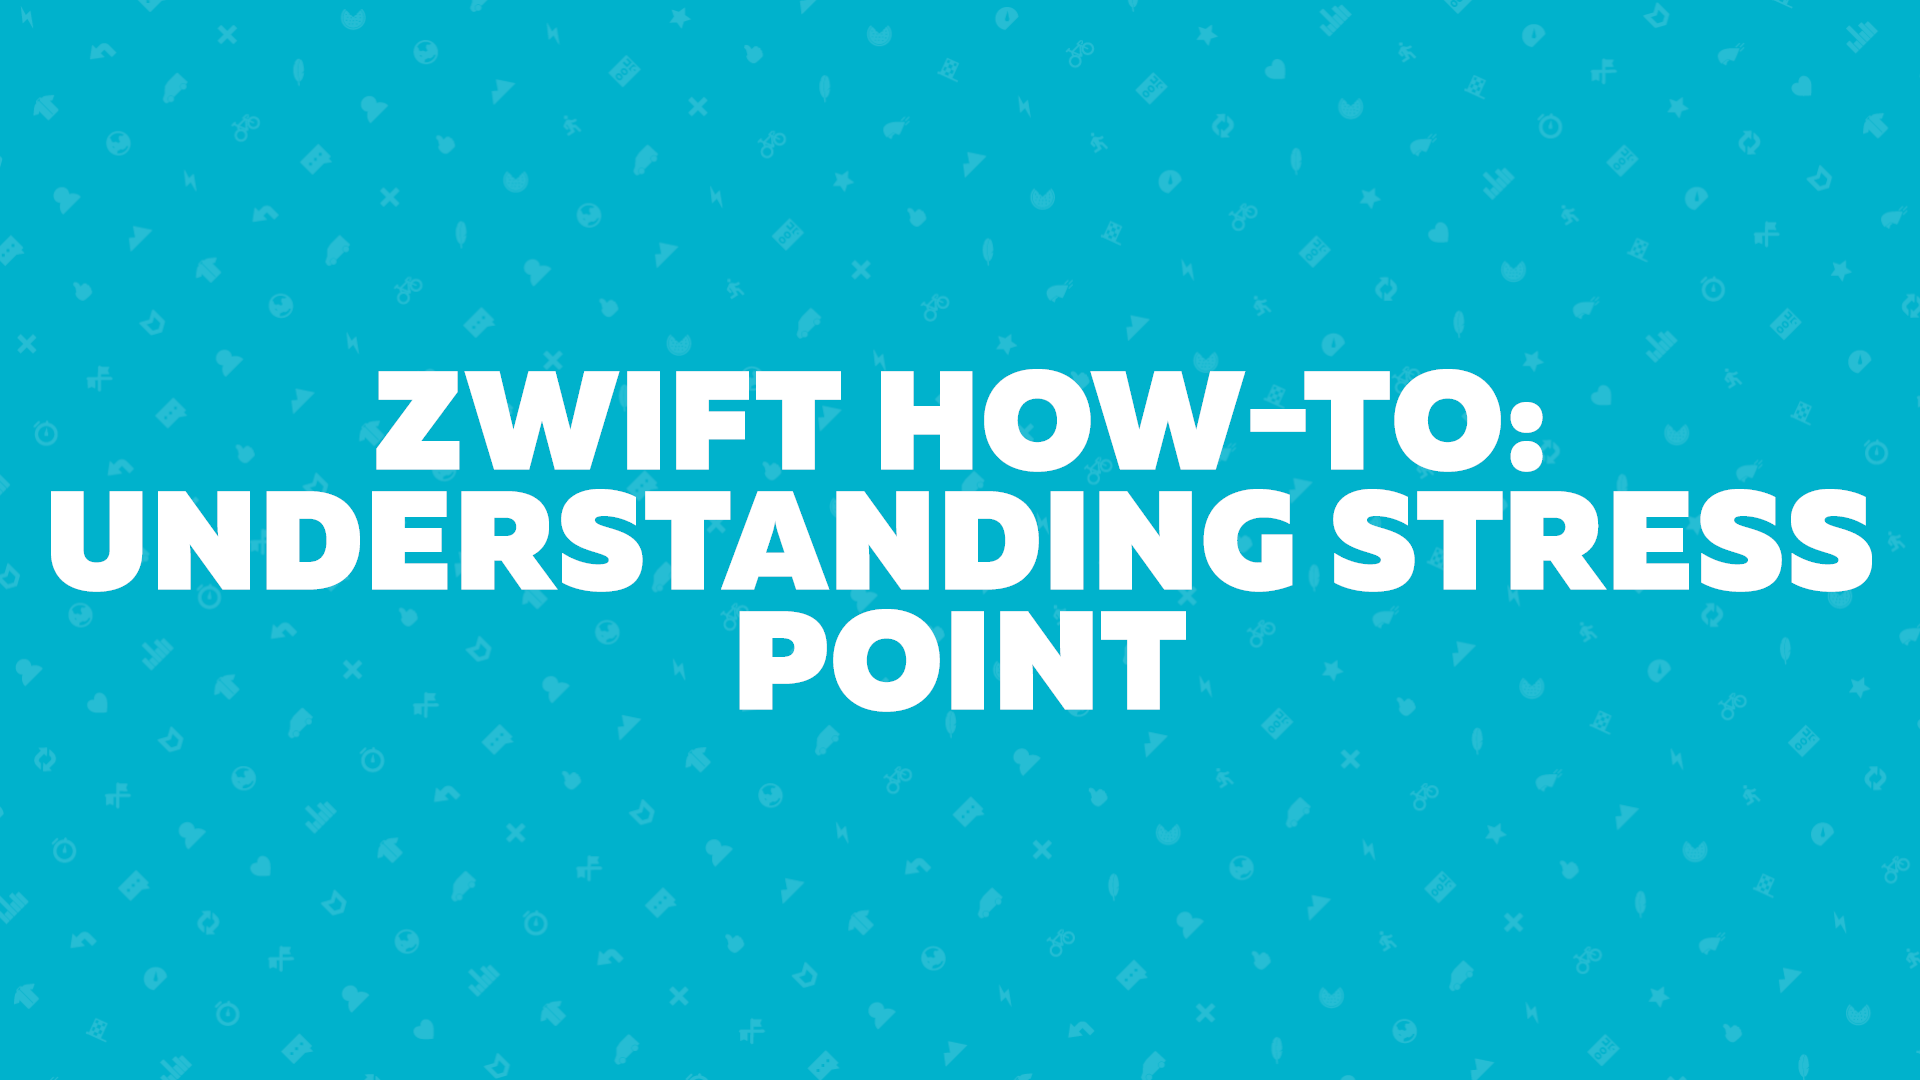 Zwift How-To: Understanding Stress Points | Zwift